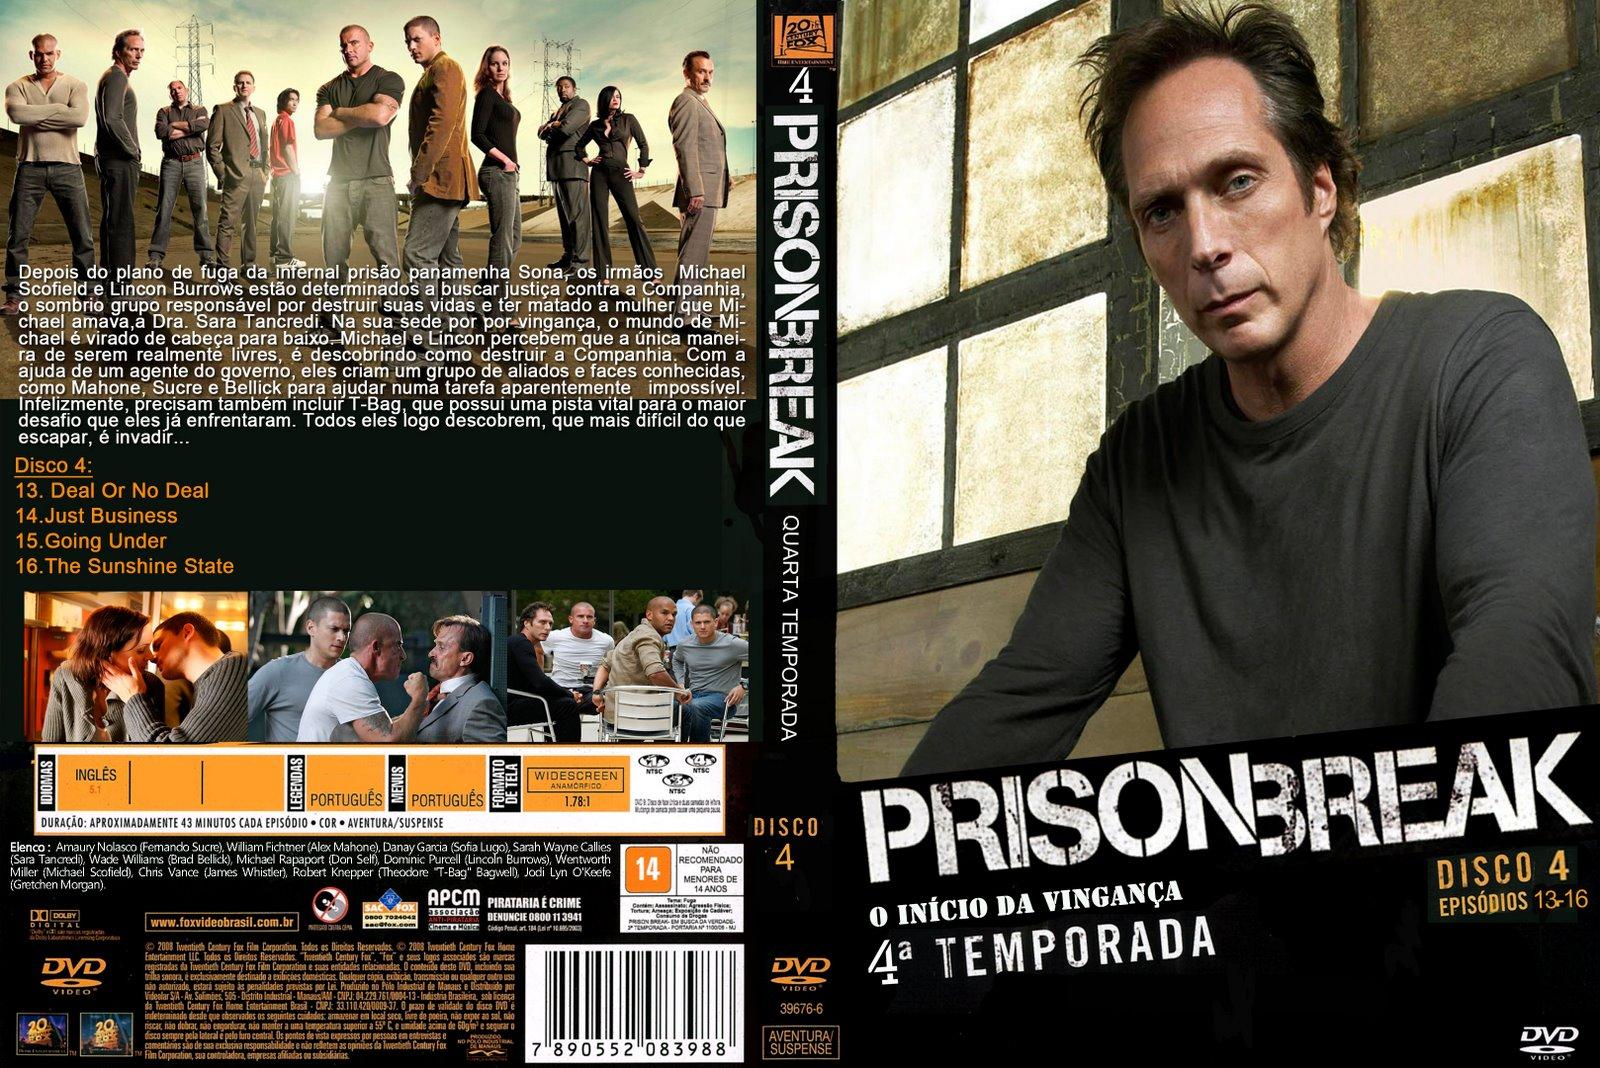 Prison Break Temporada 4 Related Keywords & Suggestions - Prison ...